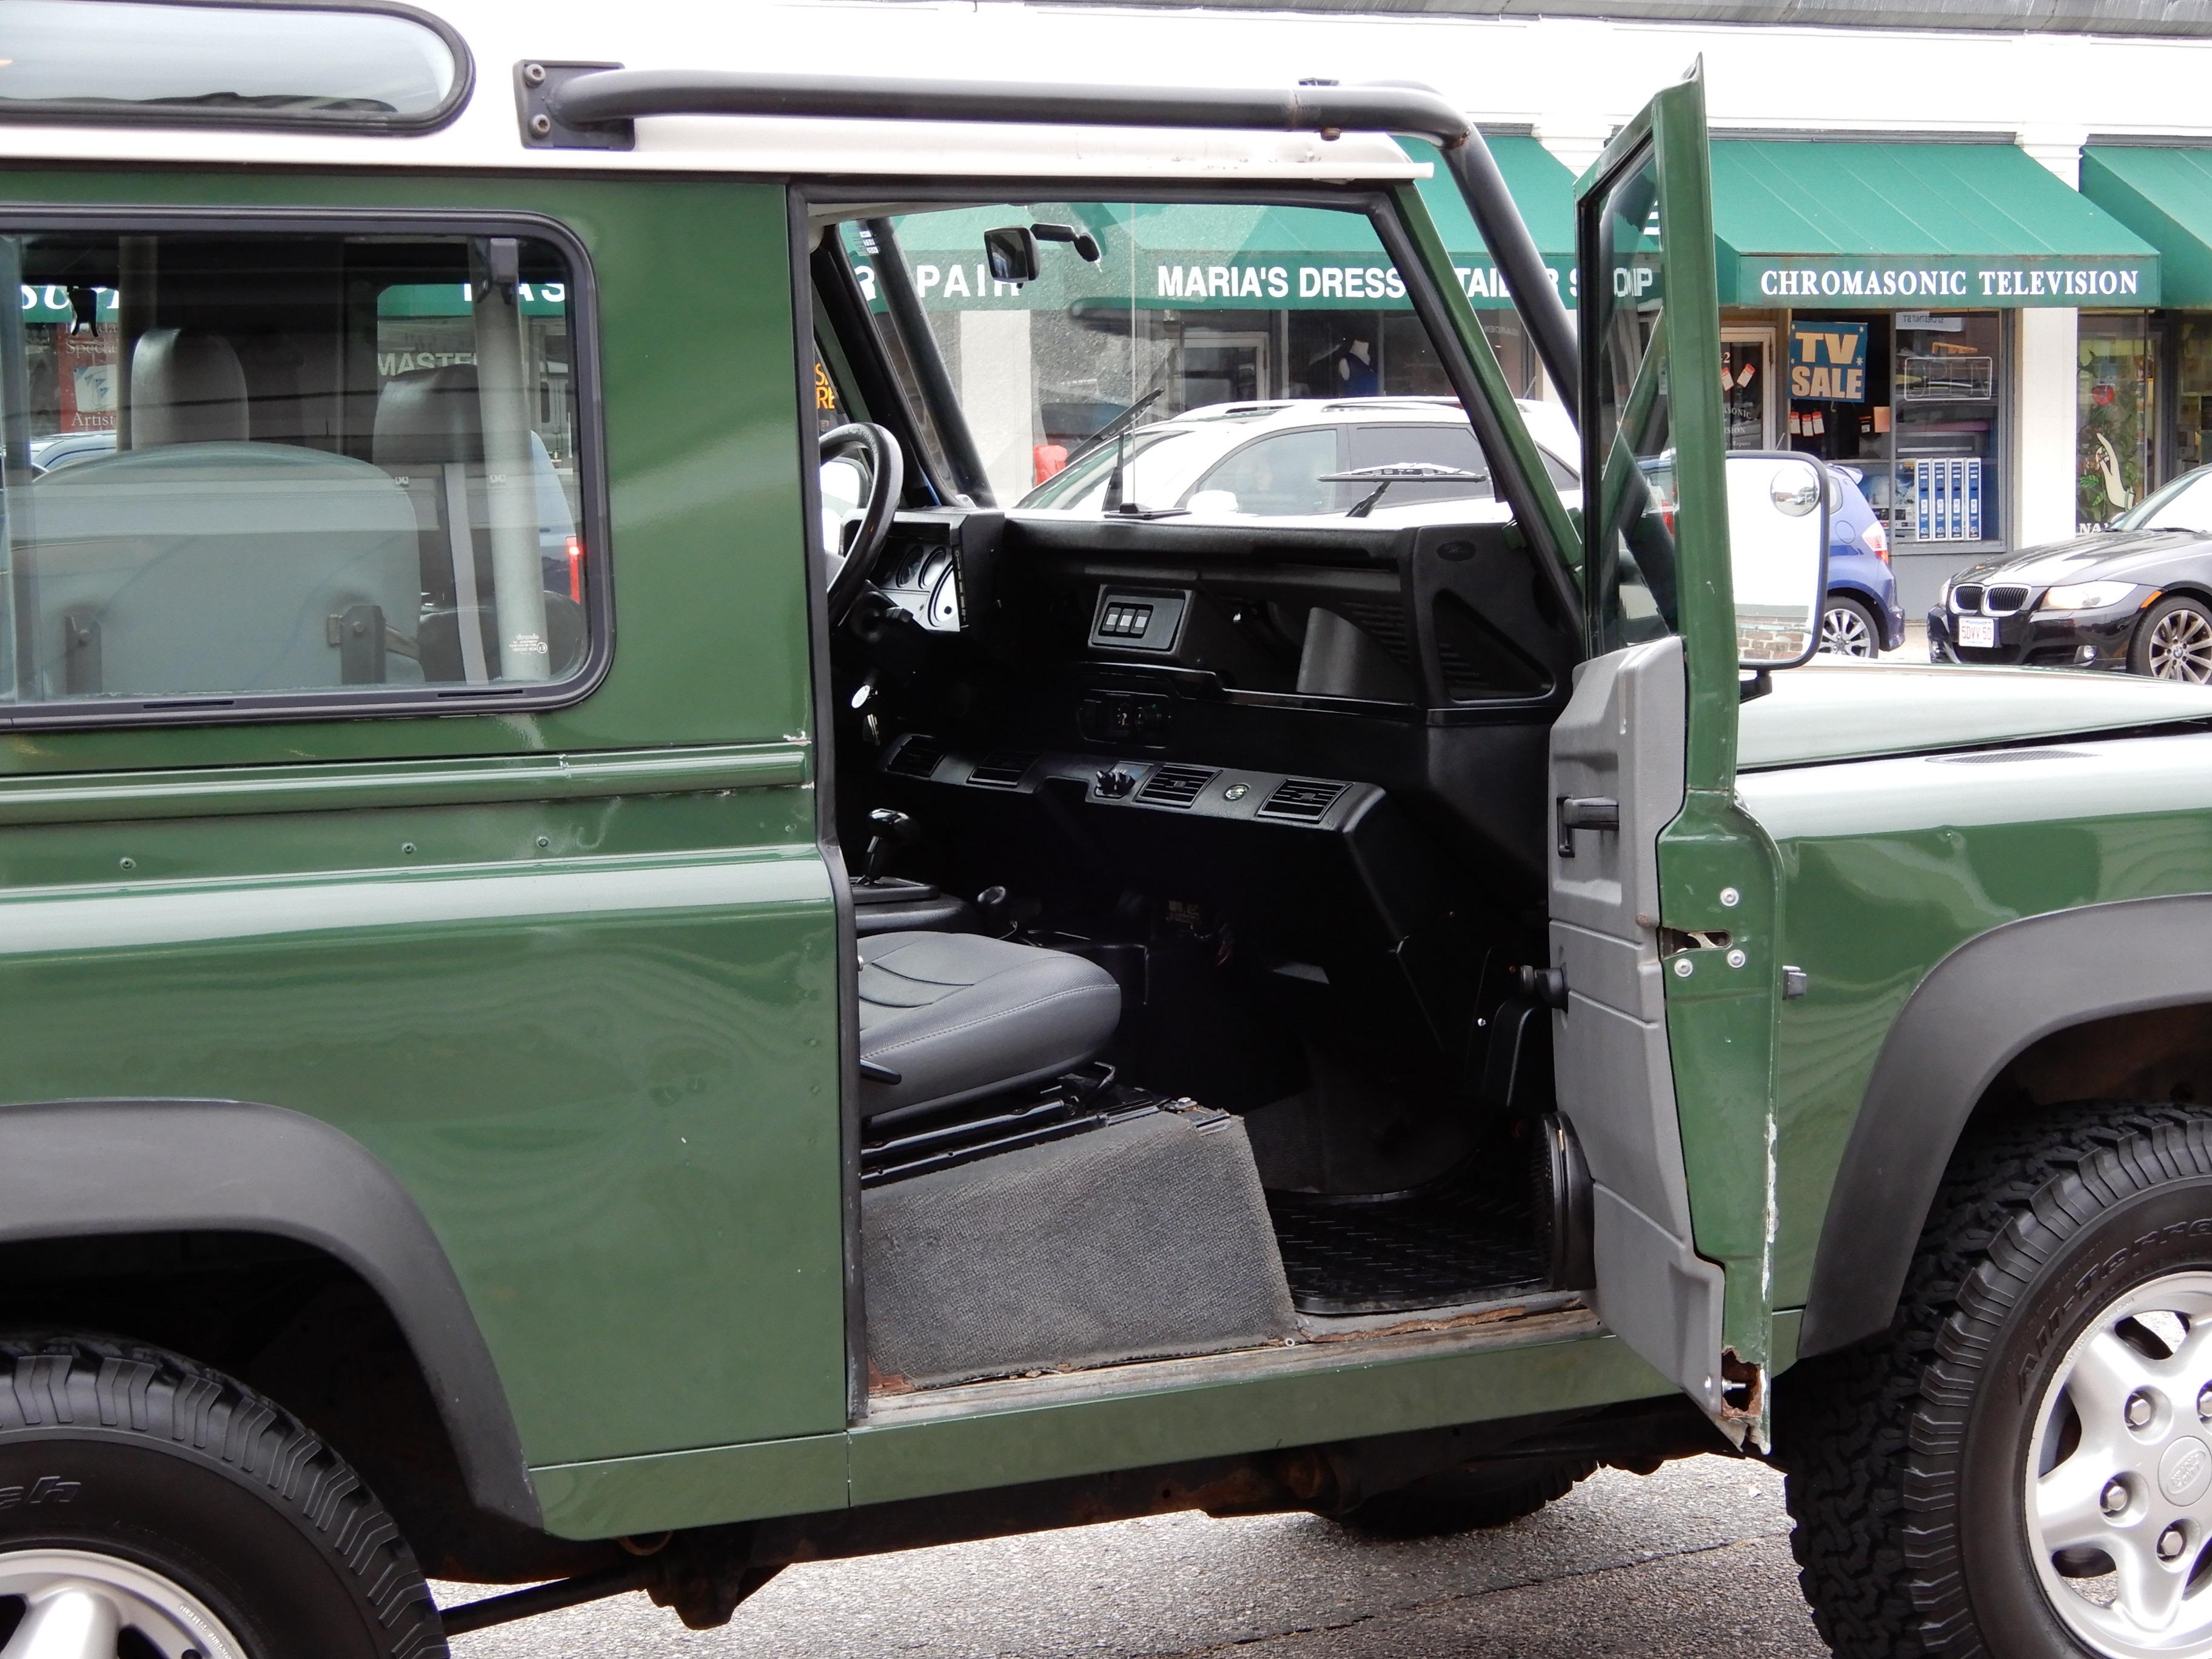 1997 Land Rover Defender 90 station wagon